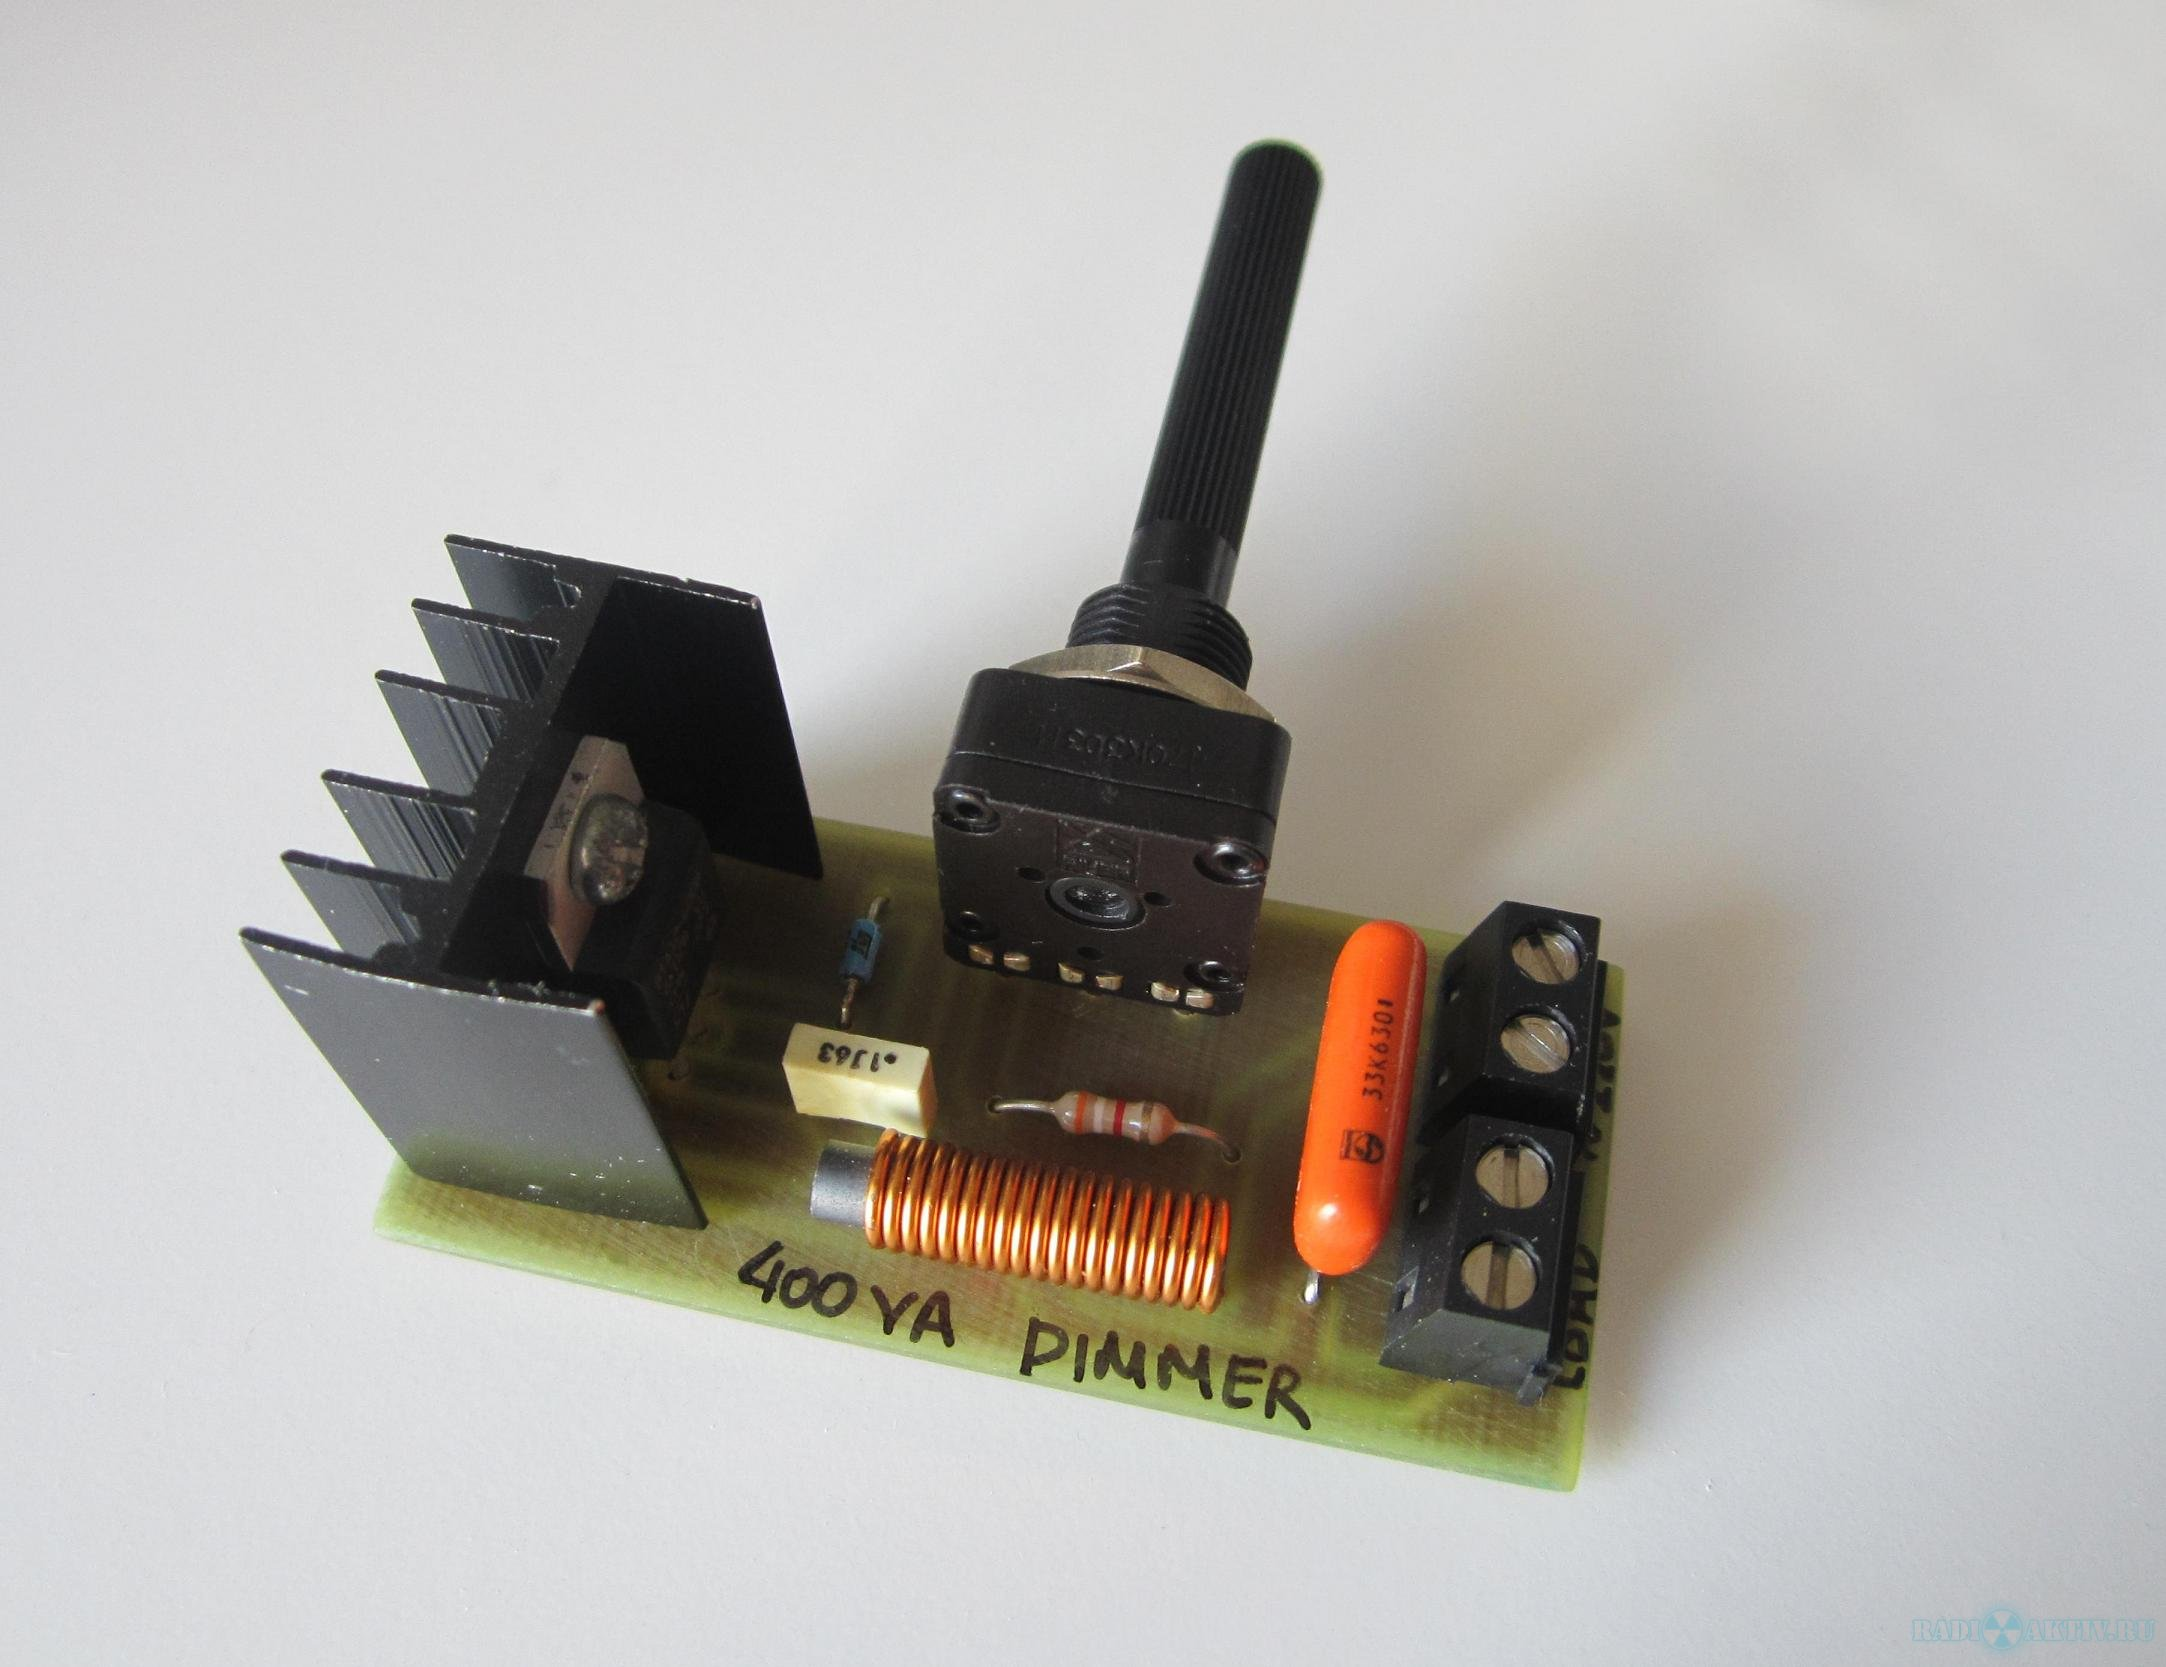 схема регулятора мощности на симисторе и микросхеме